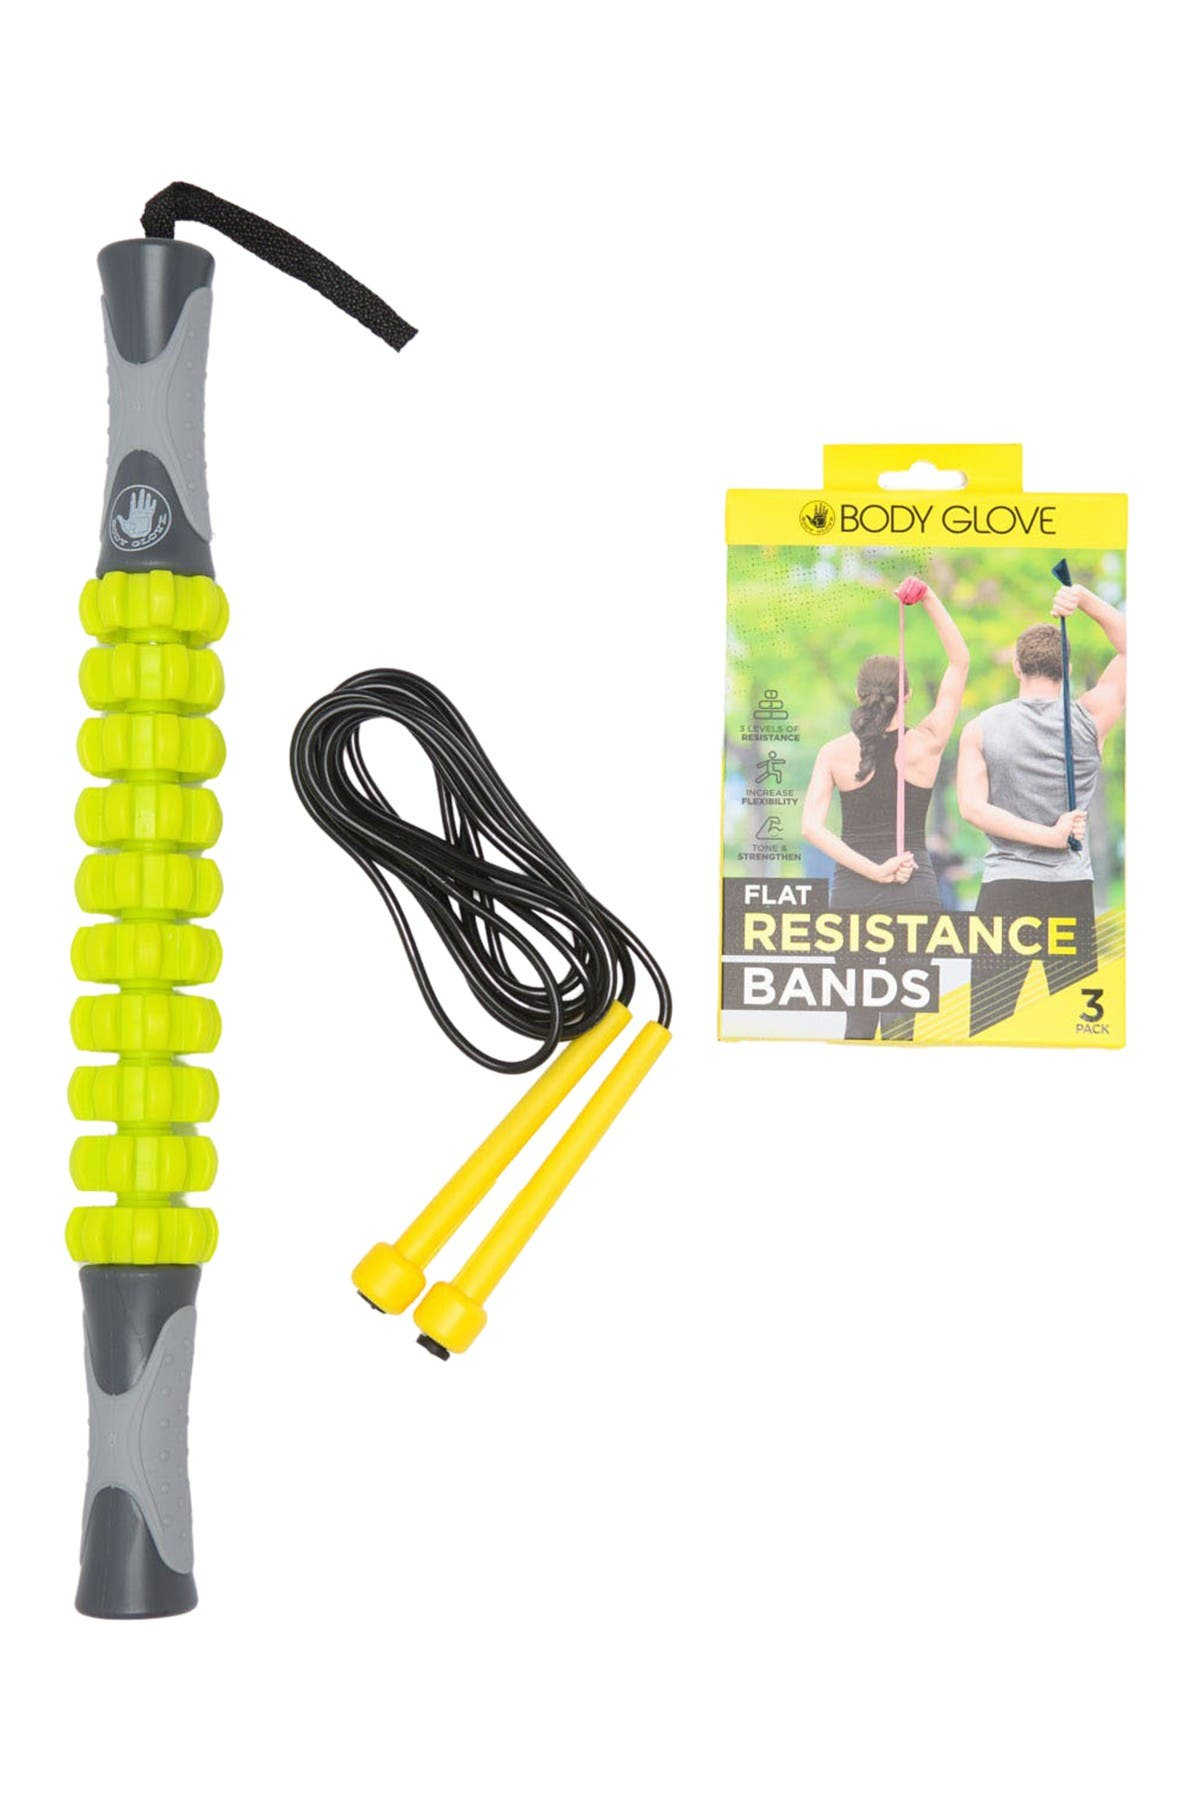 Image of Merkury Innovations Massage Roller, Jump Rope, & Resistant Bands 5-Piece Bundle